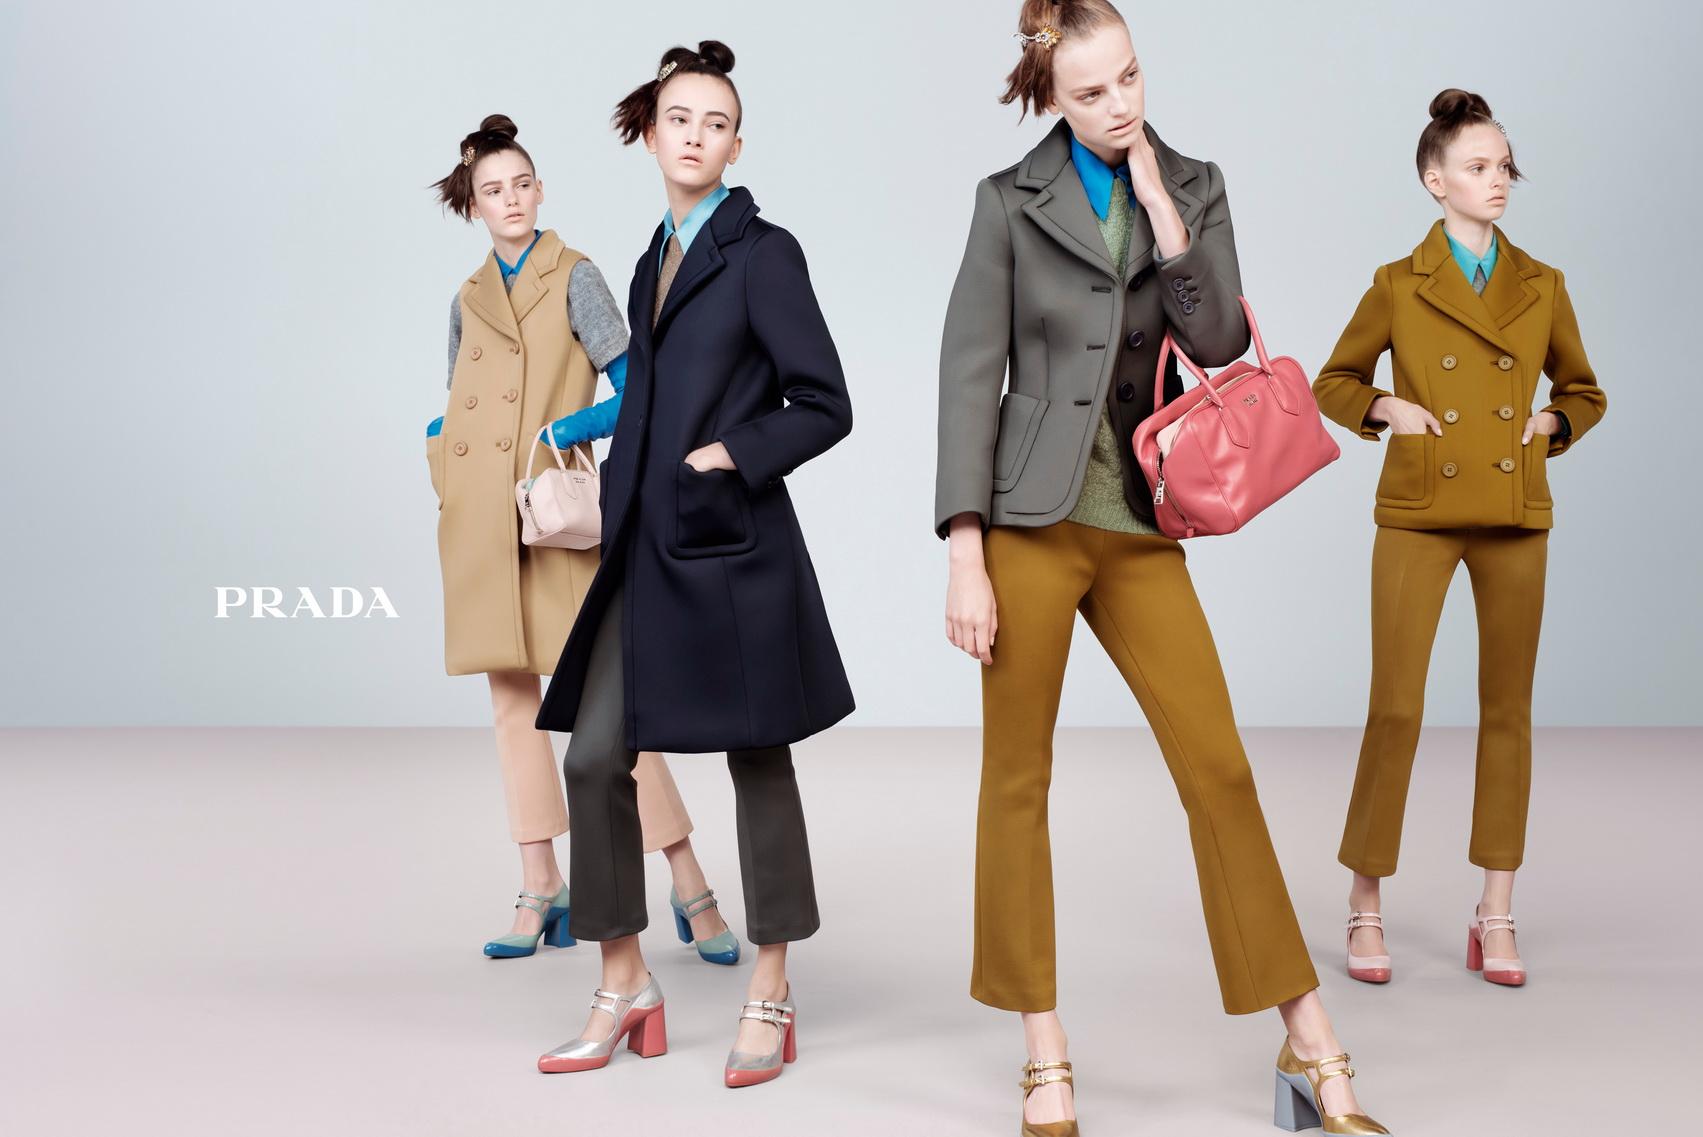 Prada-FW15-Womenswear-Adv-Campaign-image_03